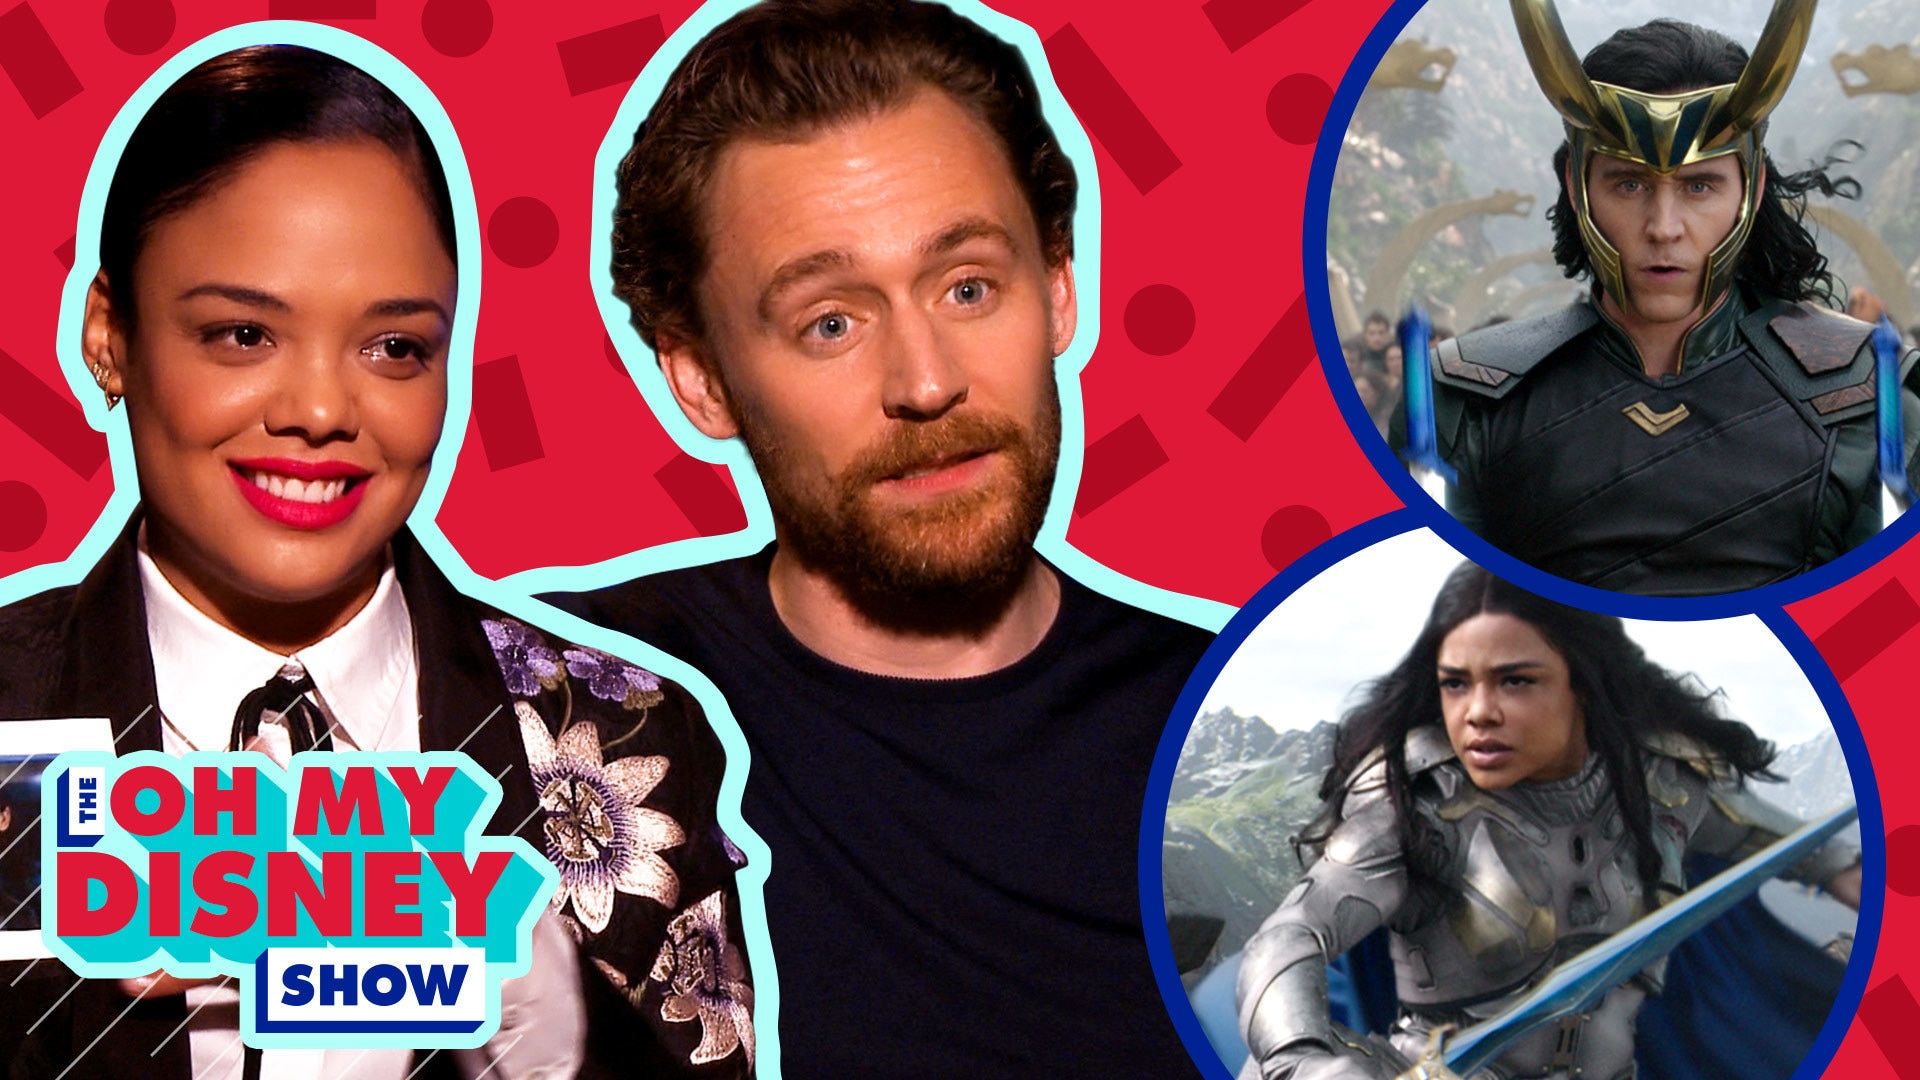 Tom Hiddleston and Tessa Thompson Play Loki or Low-key | Oh My Disney